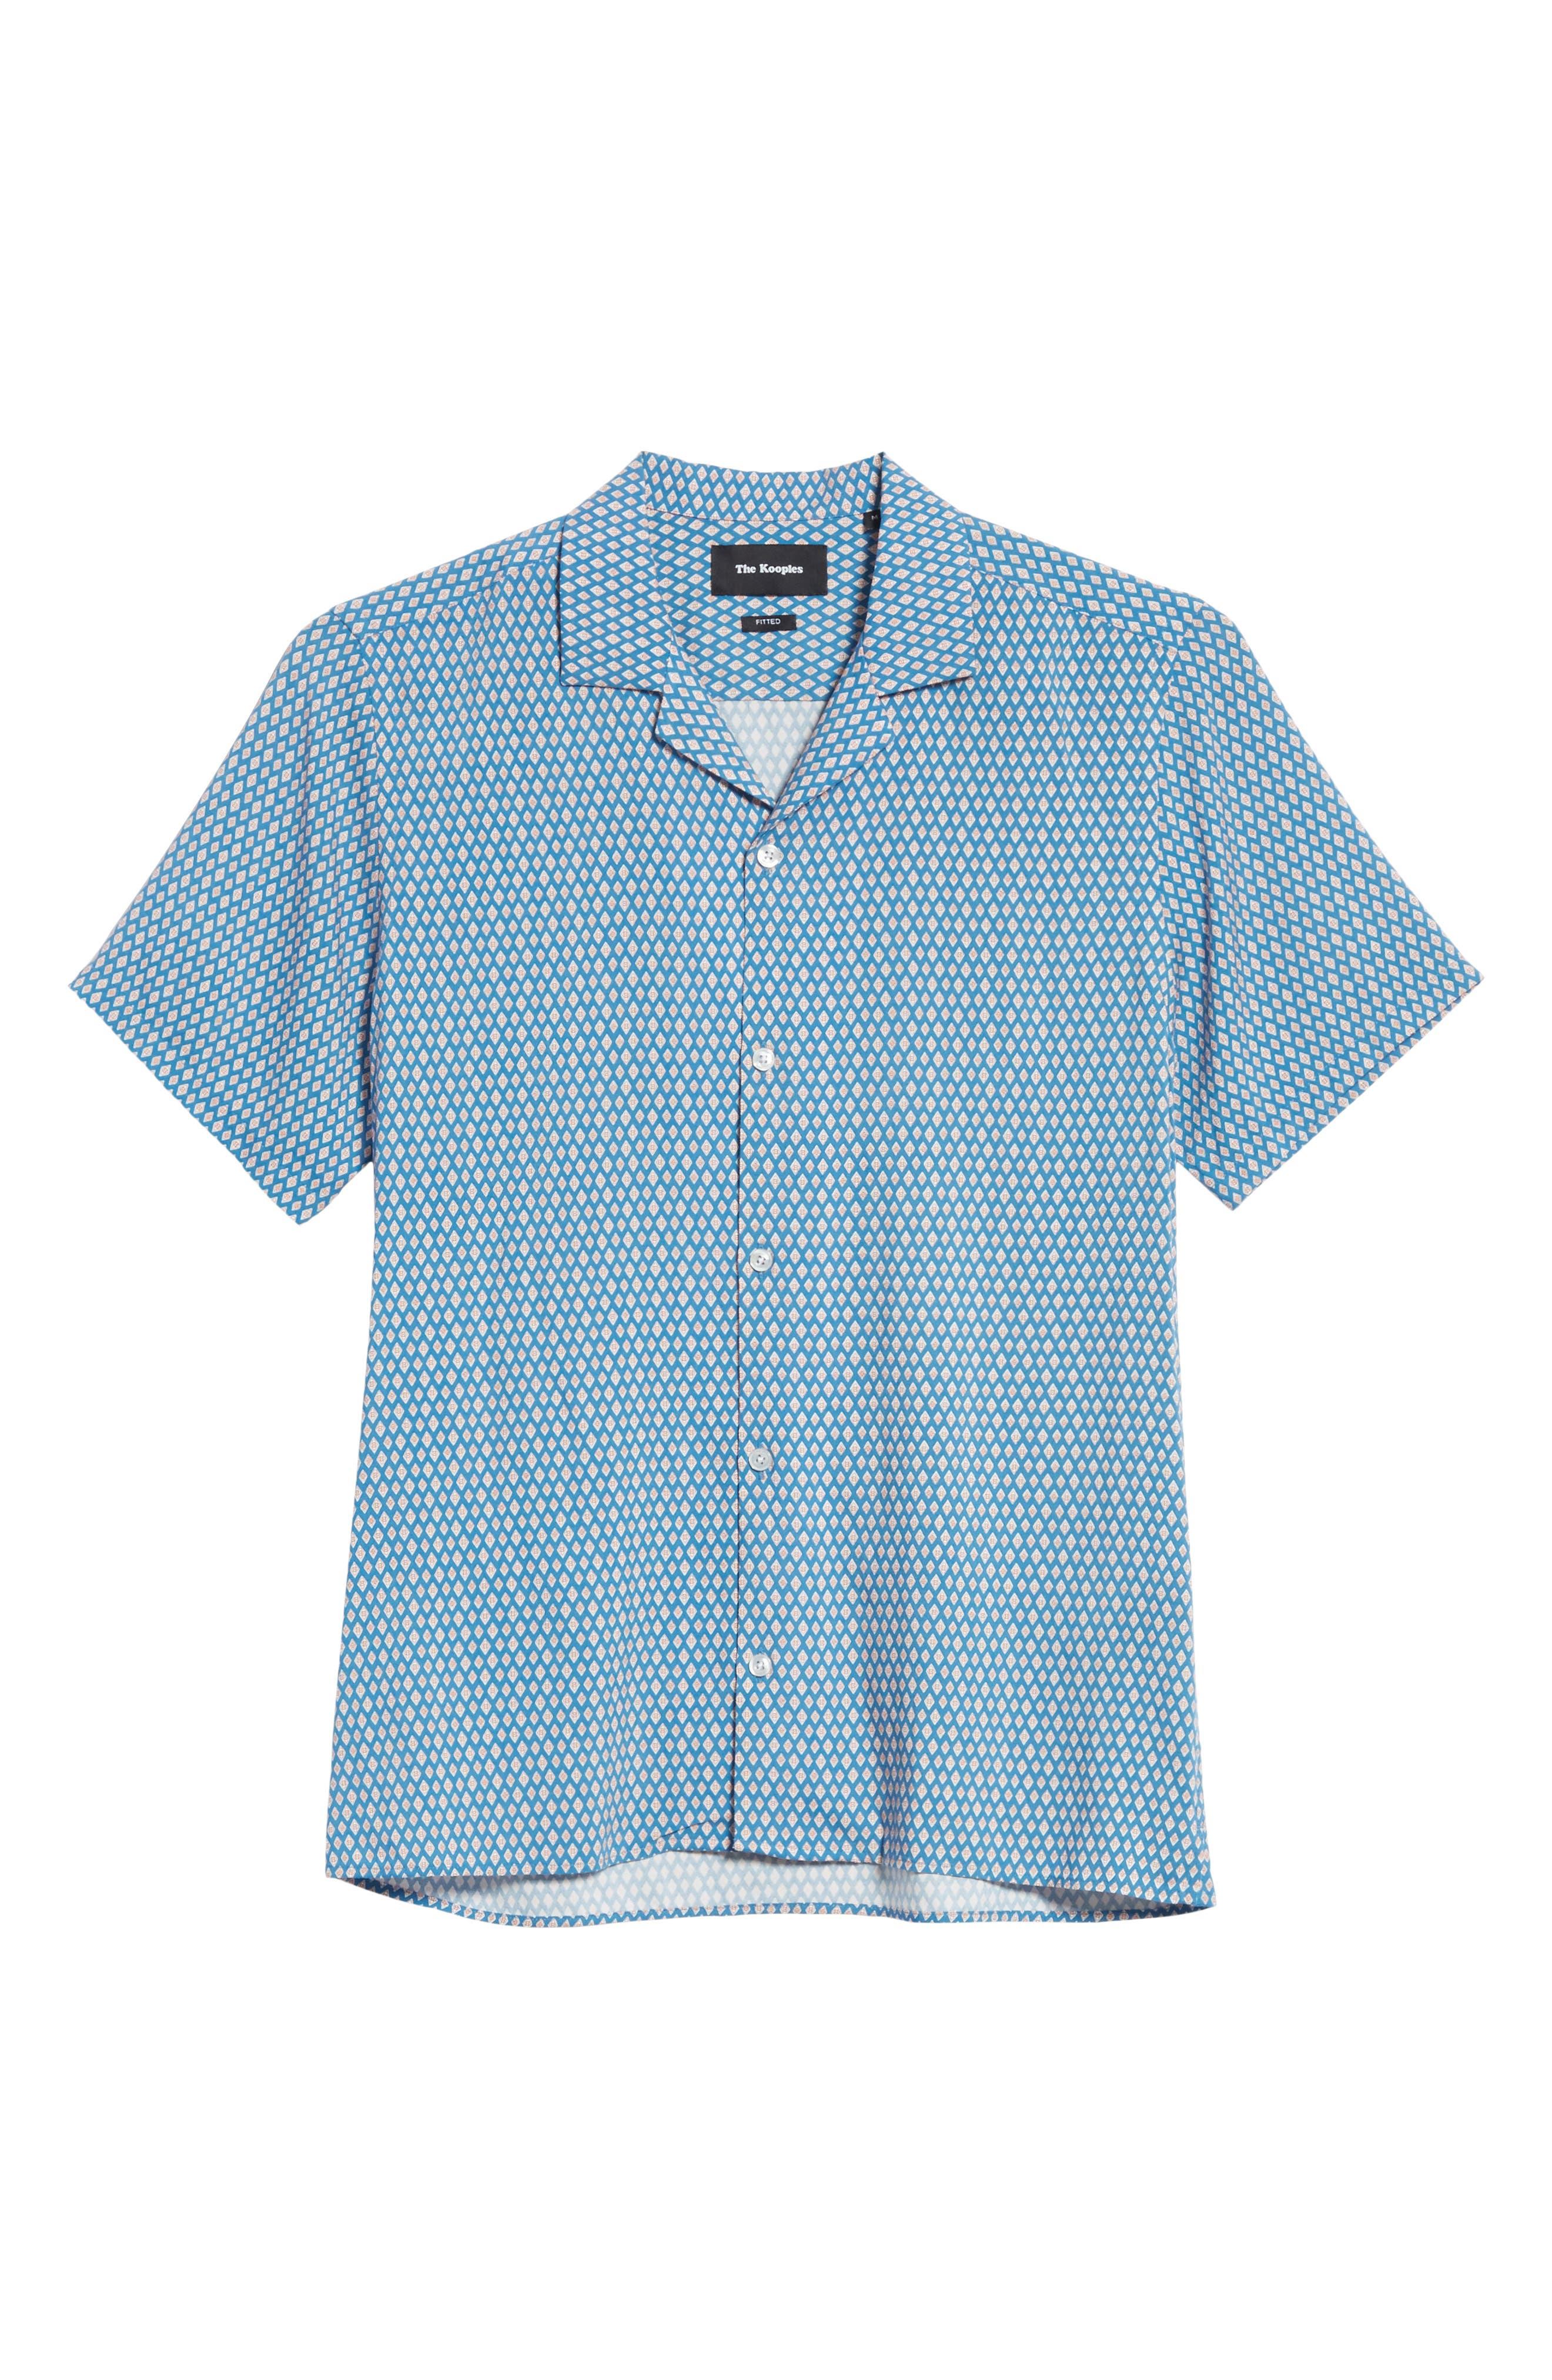 Diamond Print Camp Shirt,                             Alternate thumbnail 6, color,                             Blu 36